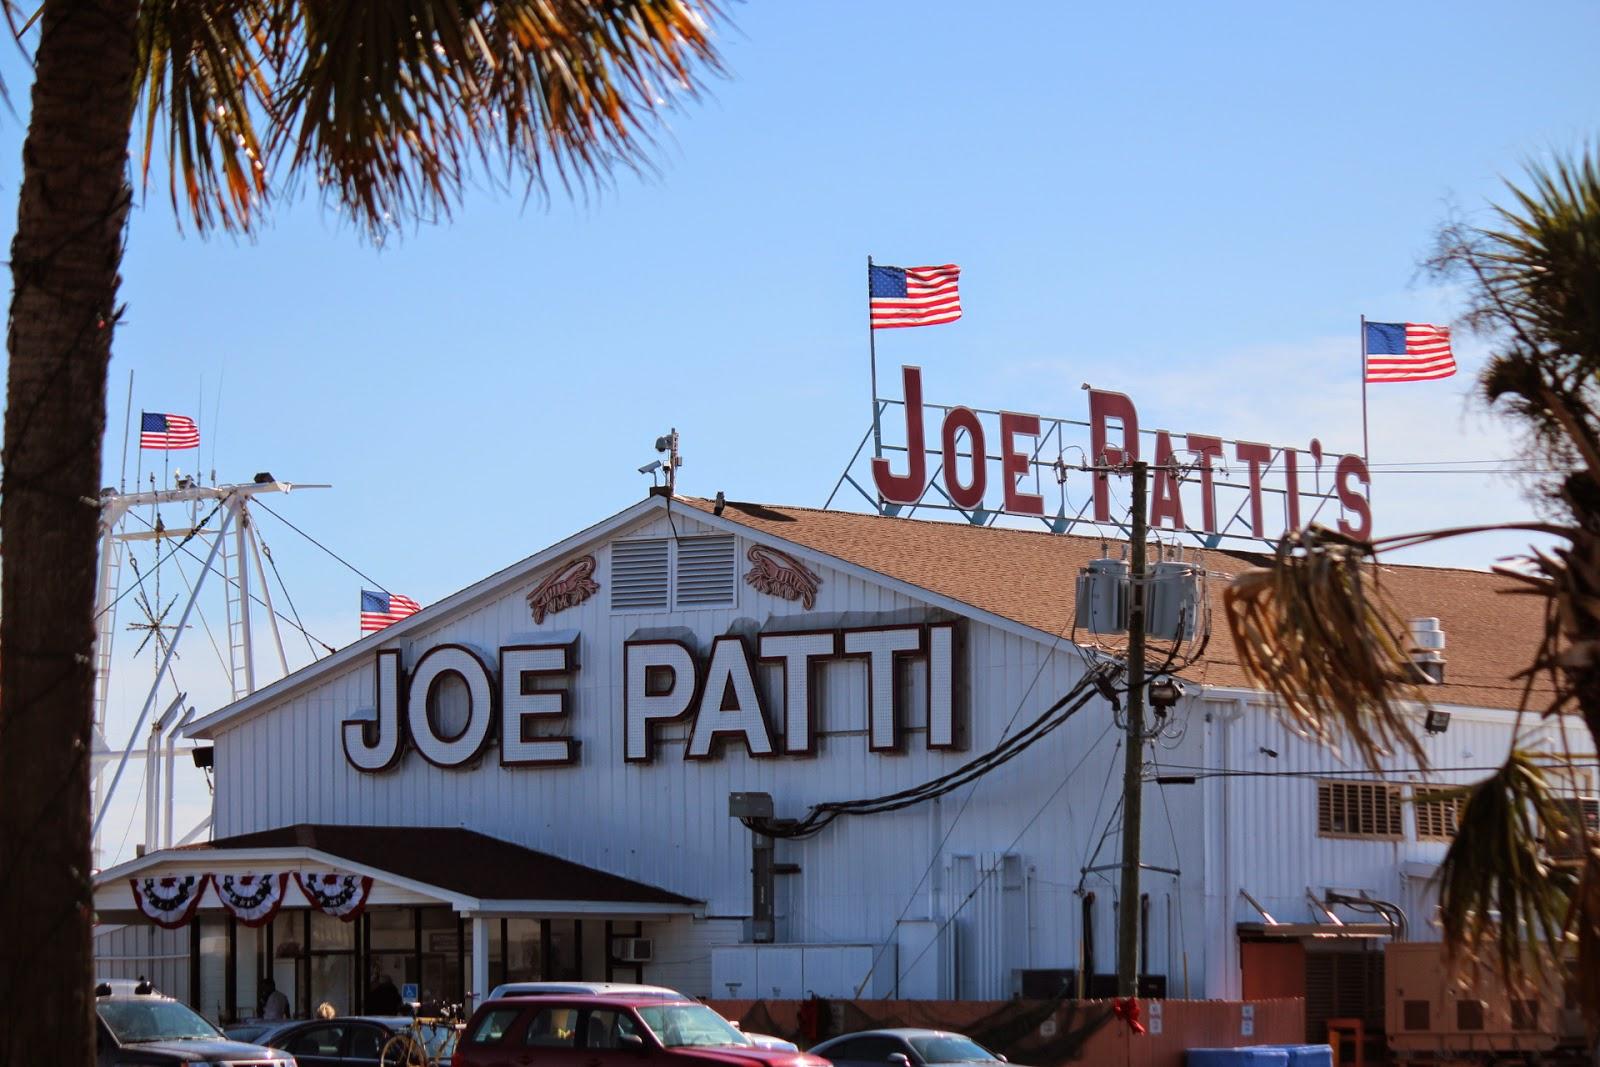 Joe Patti's Seafood Market in Pensacola, FL 32502 ~ Gulf Coast's favorite seafood market!